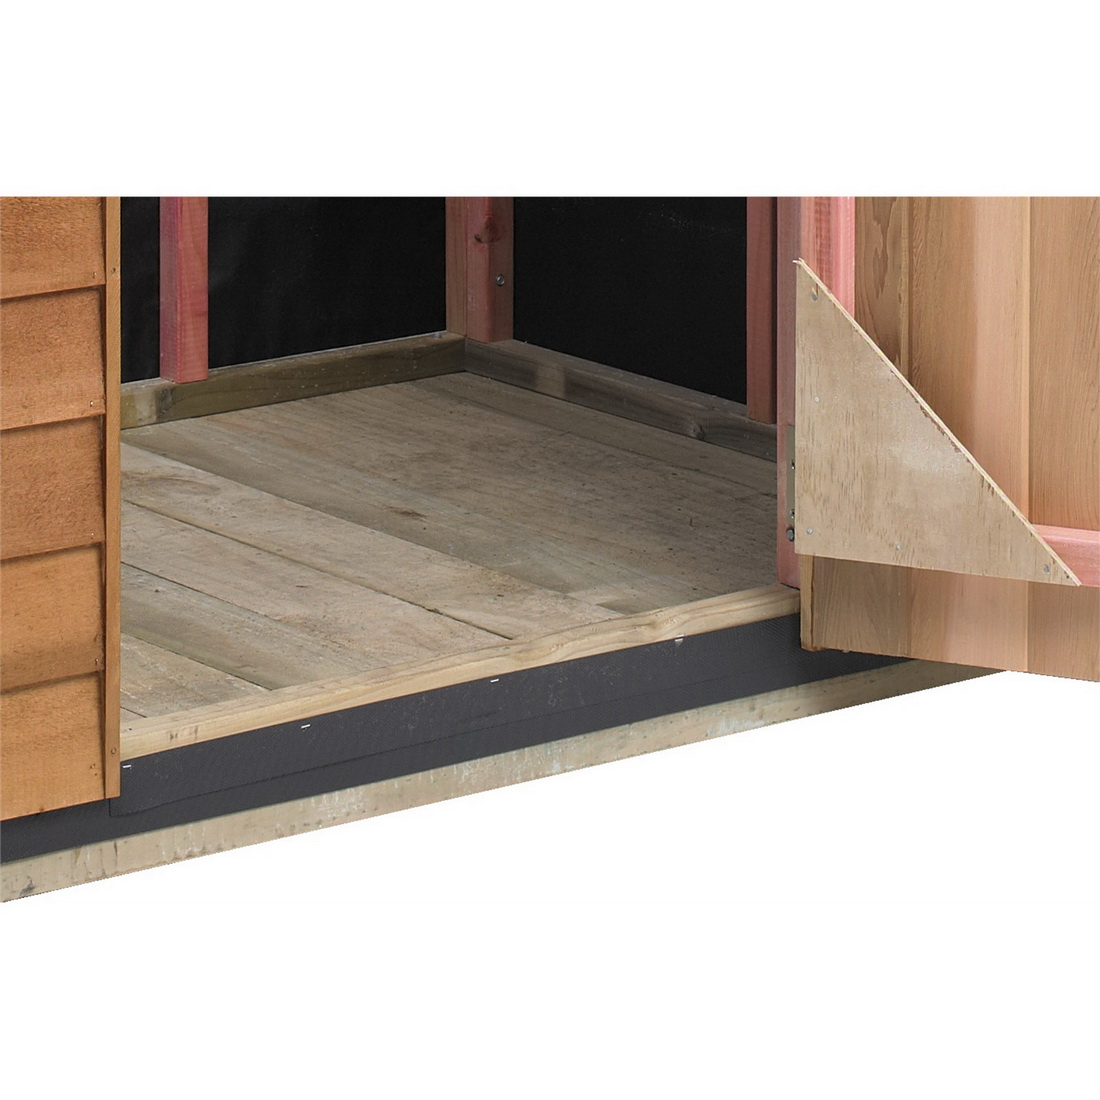 Urban Garden Shed Timber Floor Kit